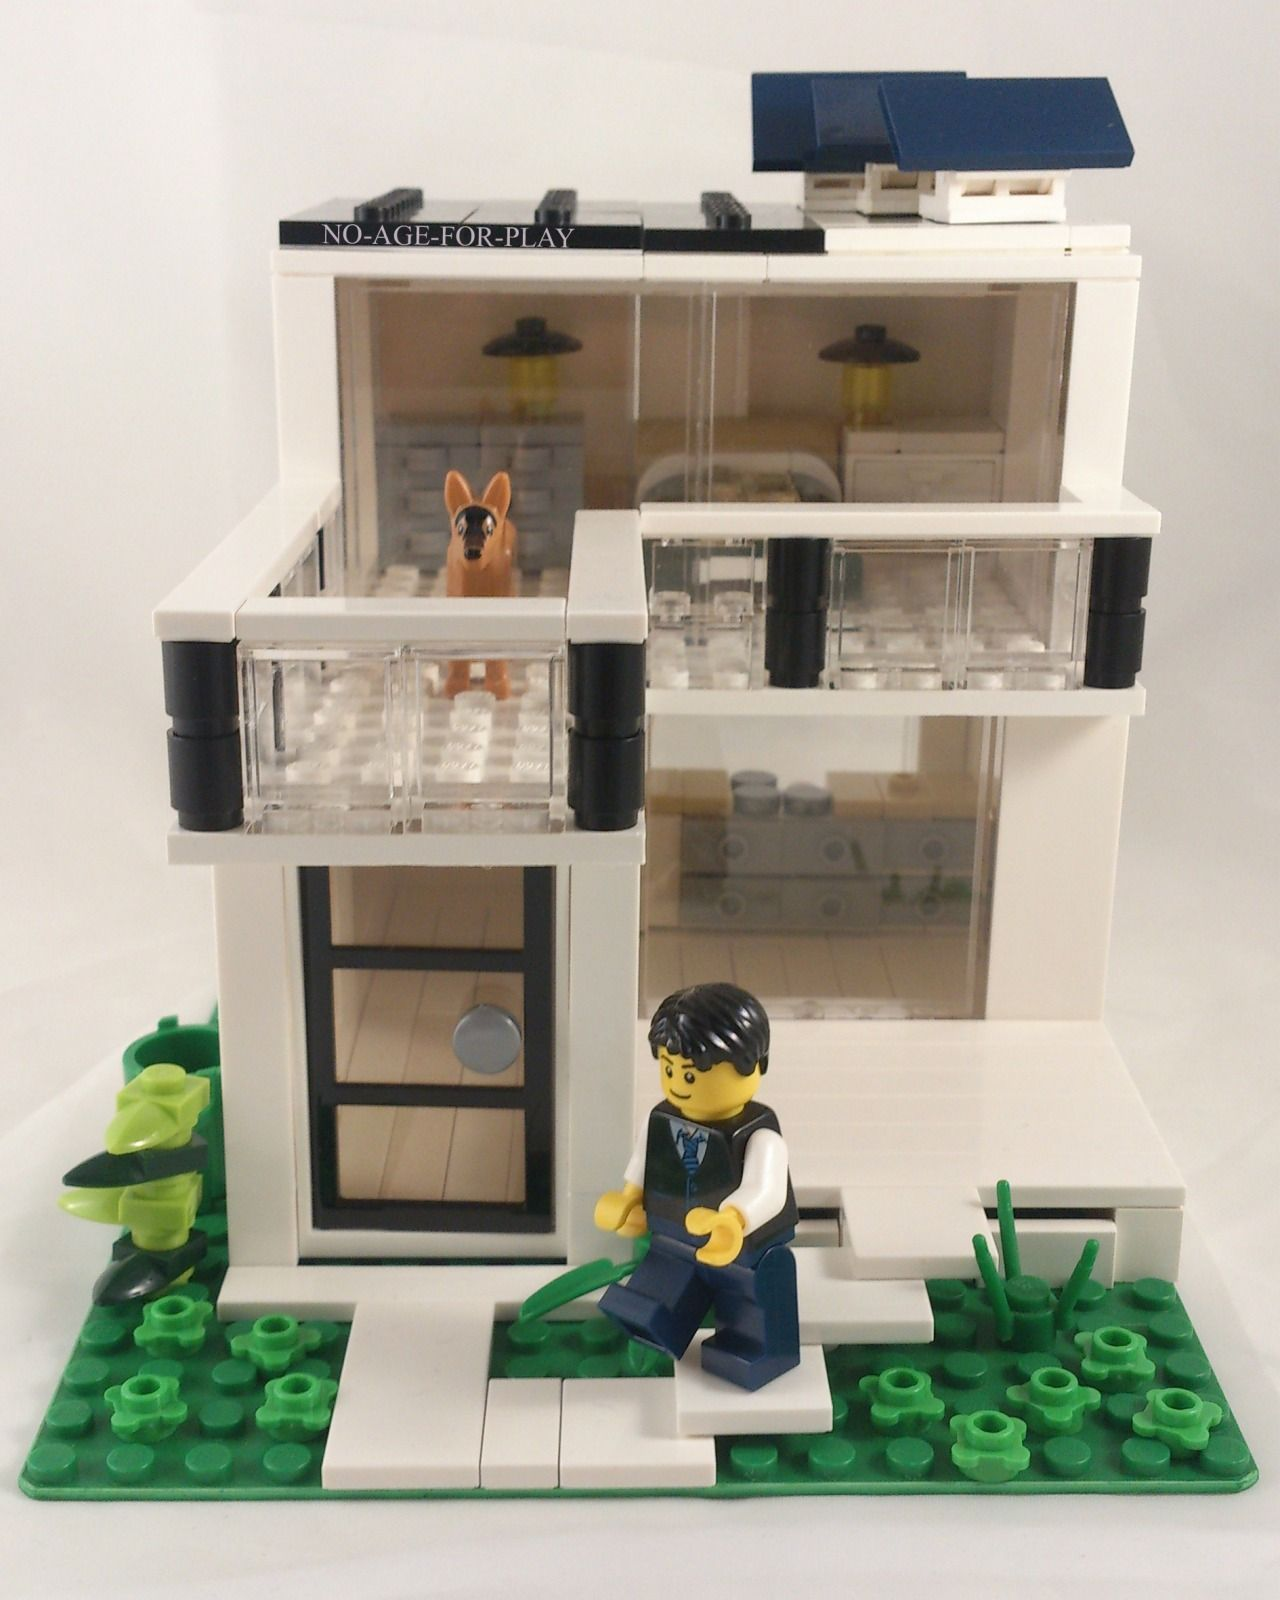 12 Lego Ideen   lego ideen, lego, lego bauanleitung